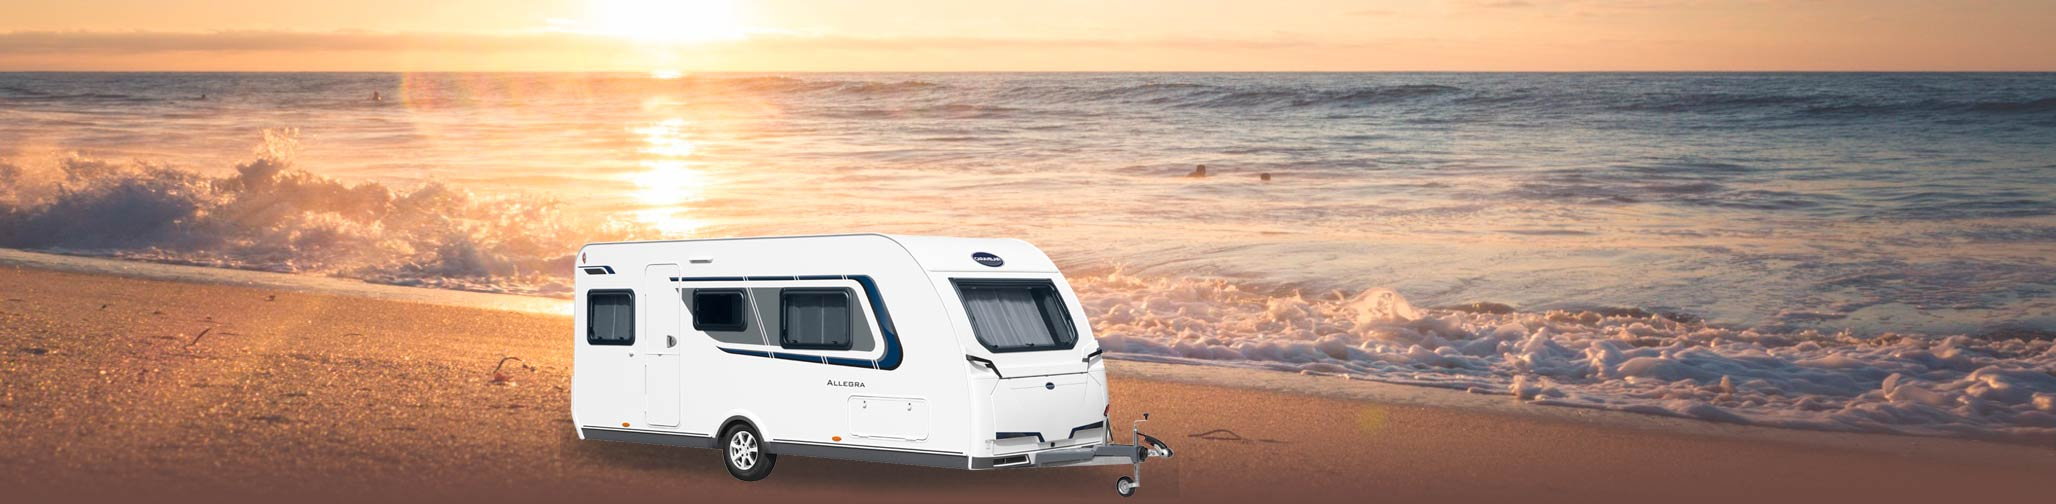 fabricant de caravanes caravane antares antares style allegra et venicia caravelair. Black Bedroom Furniture Sets. Home Design Ideas